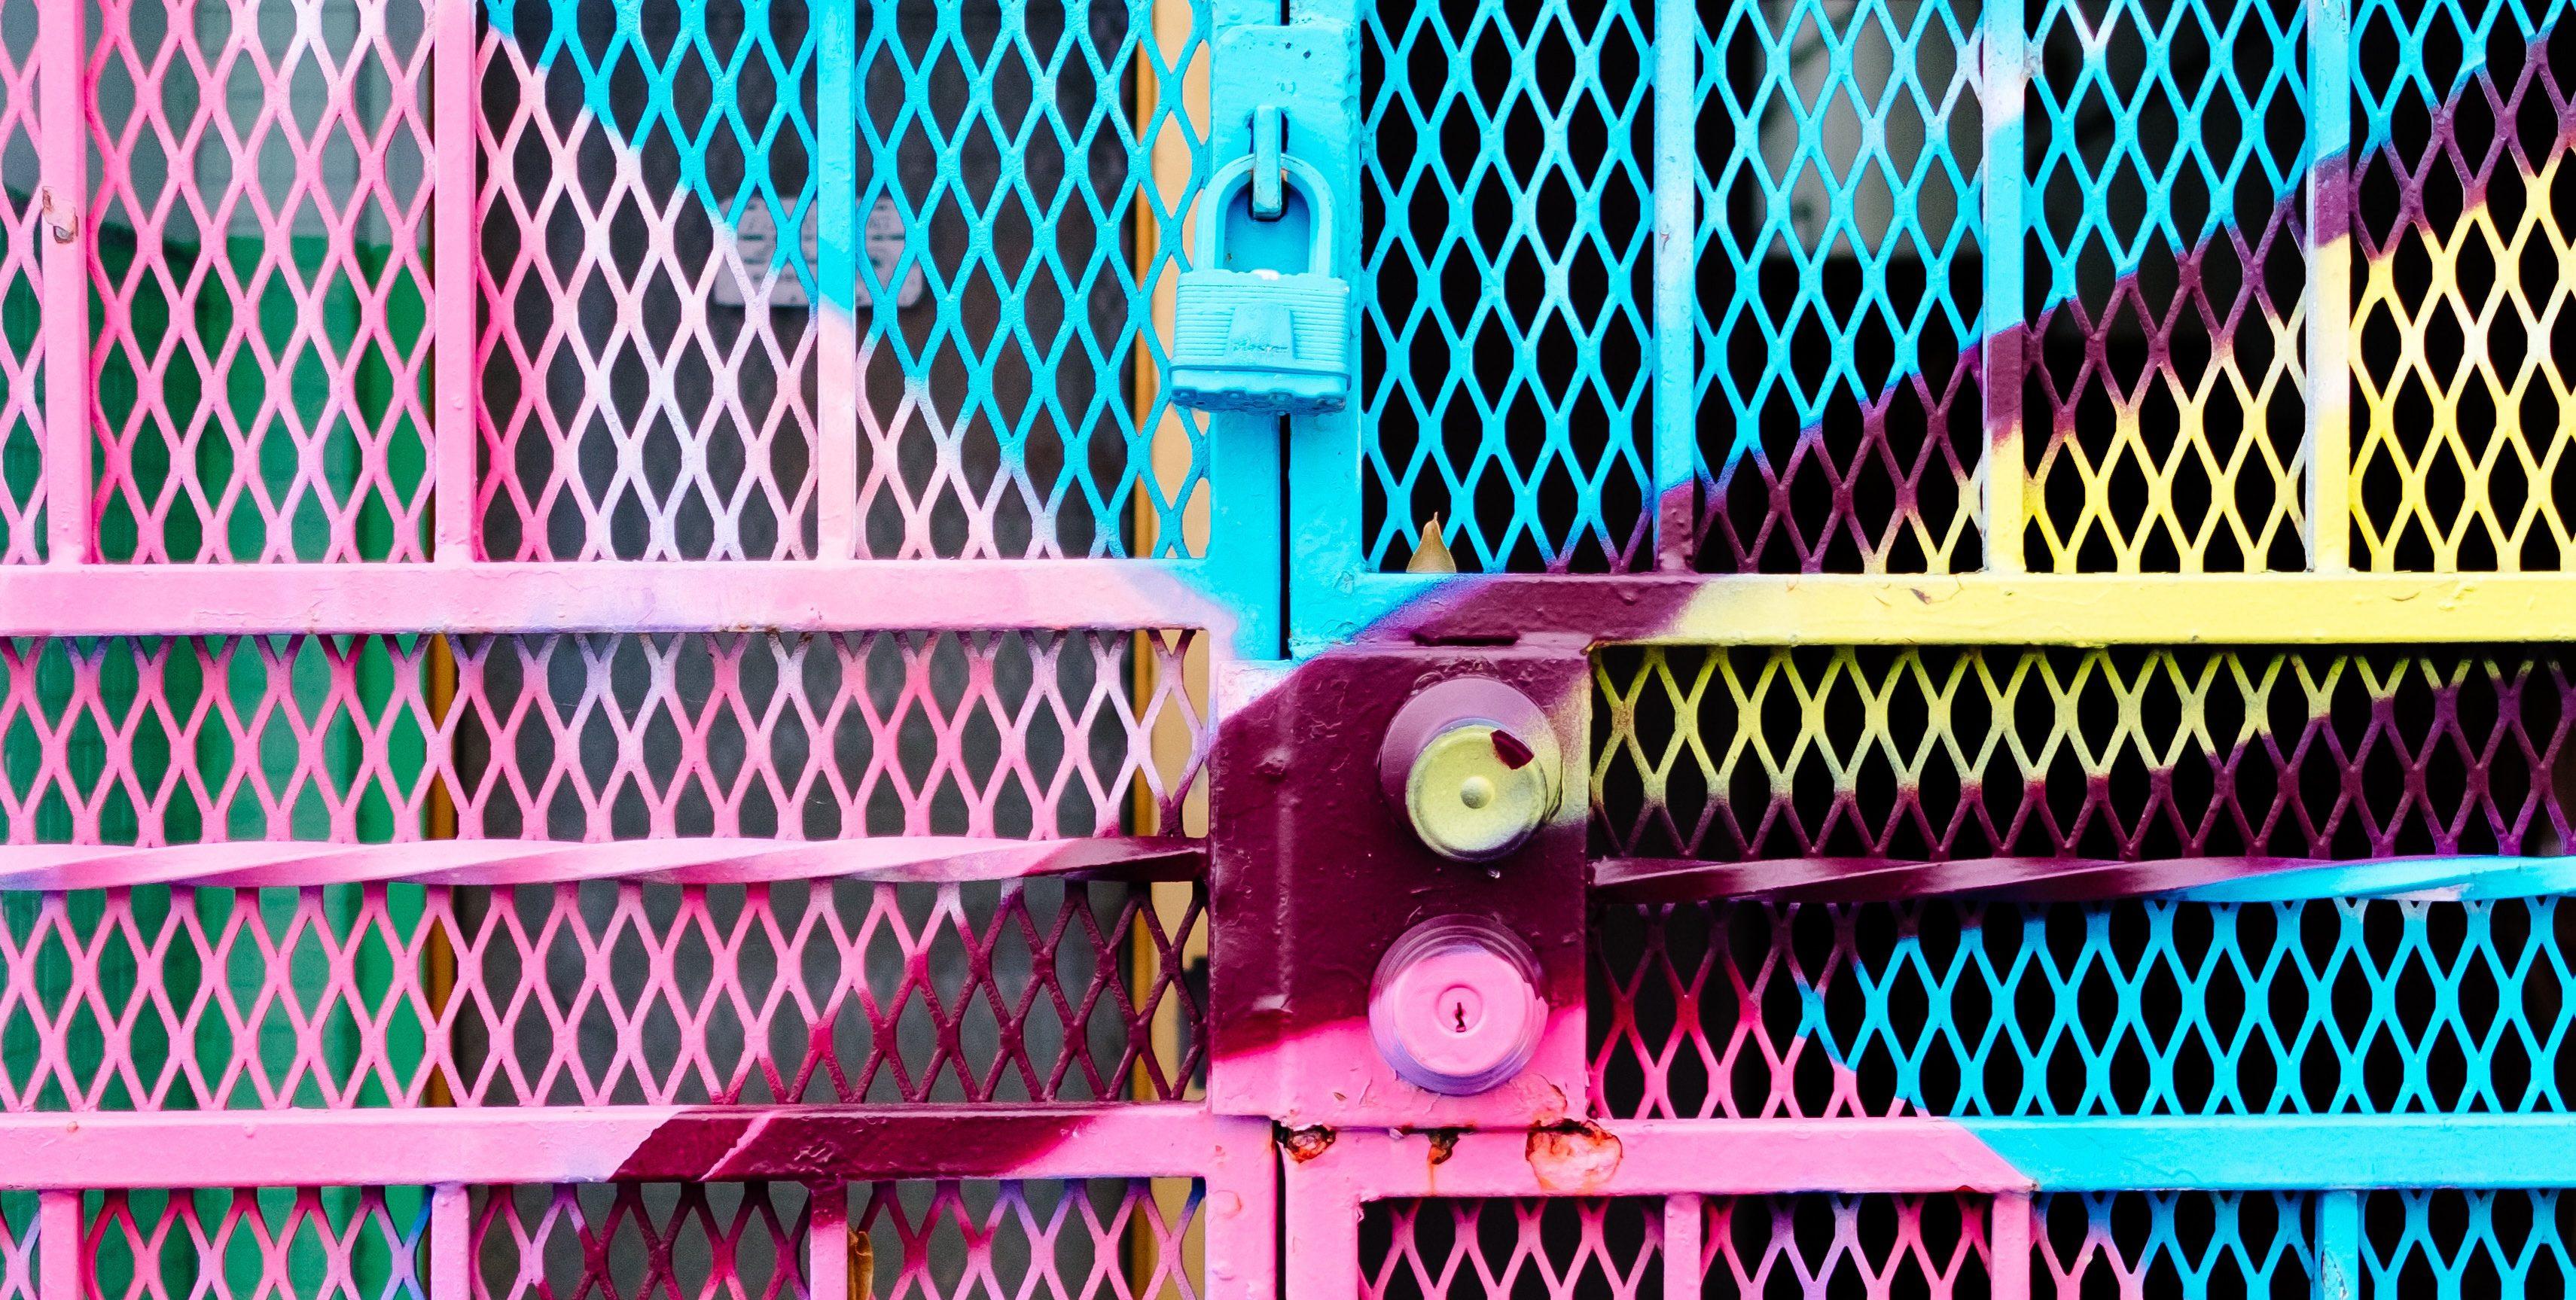 Colourful metal gate/door with padlocks